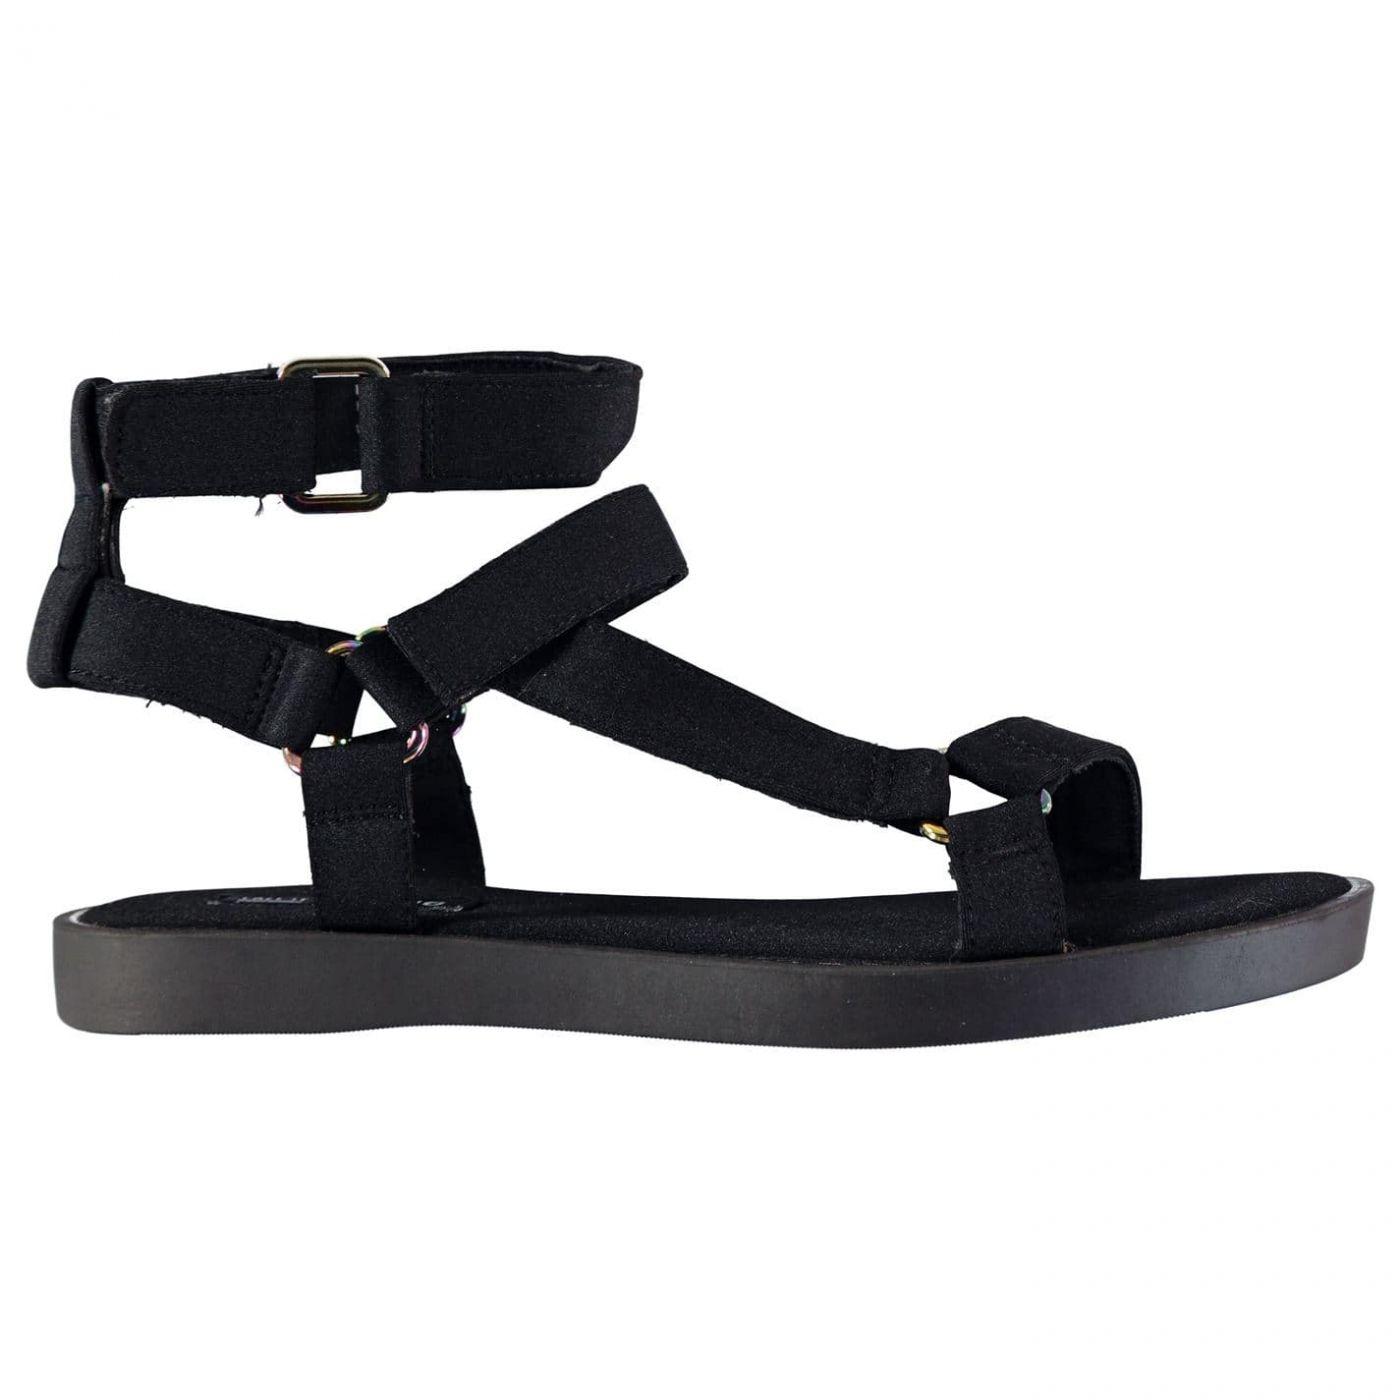 Aldo Proresien Ladies Sandals